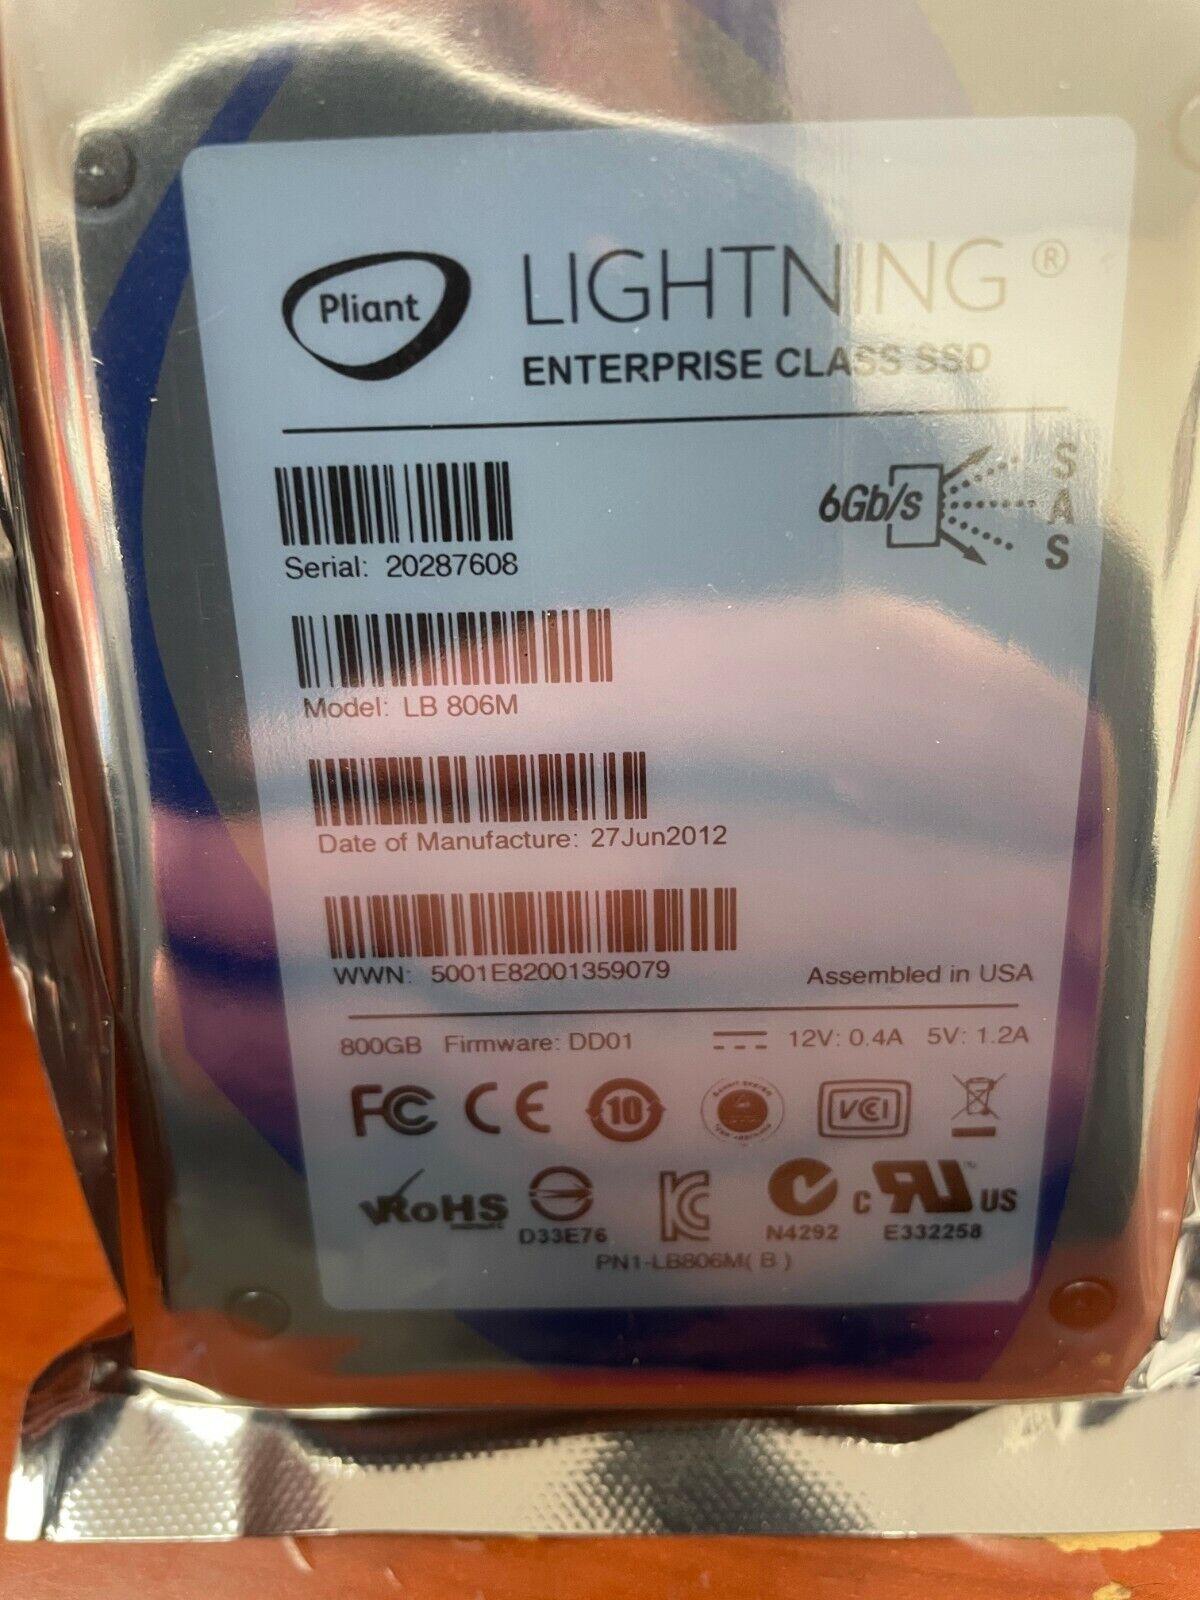 SanDisk Lightning 800GB MLC SAS 6Gbps Mixed Use LB806M  - $99.00